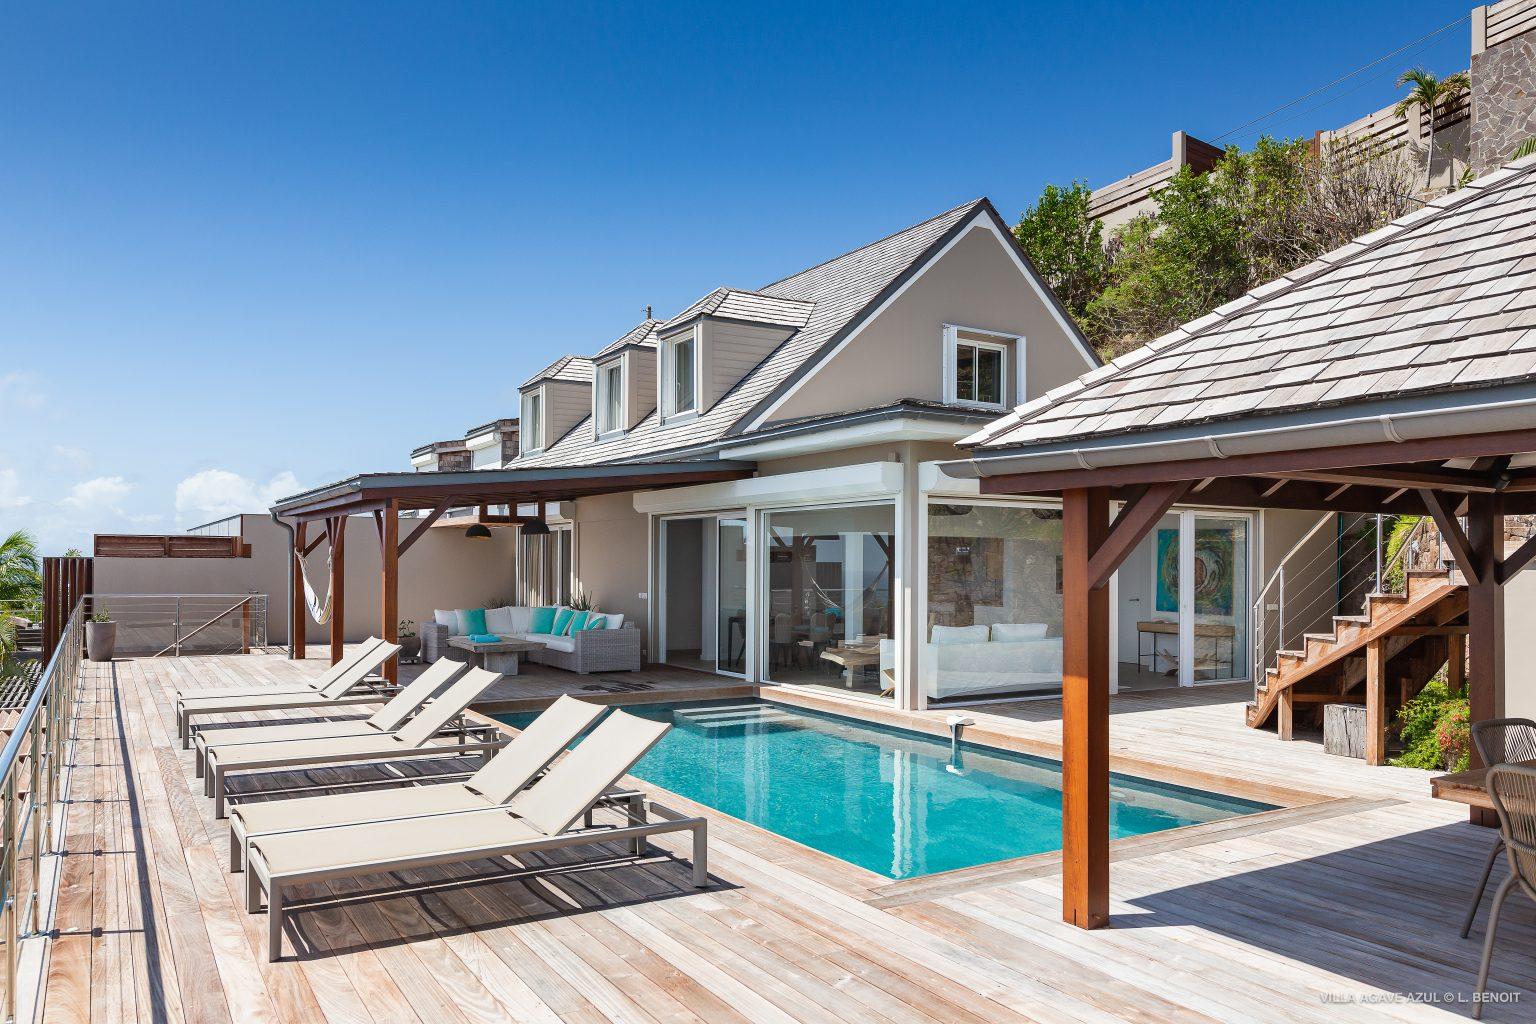 Villa Agave Azul - Villa Rental Lagoon of Grand Cul de Sac and Ocean view - Outside view